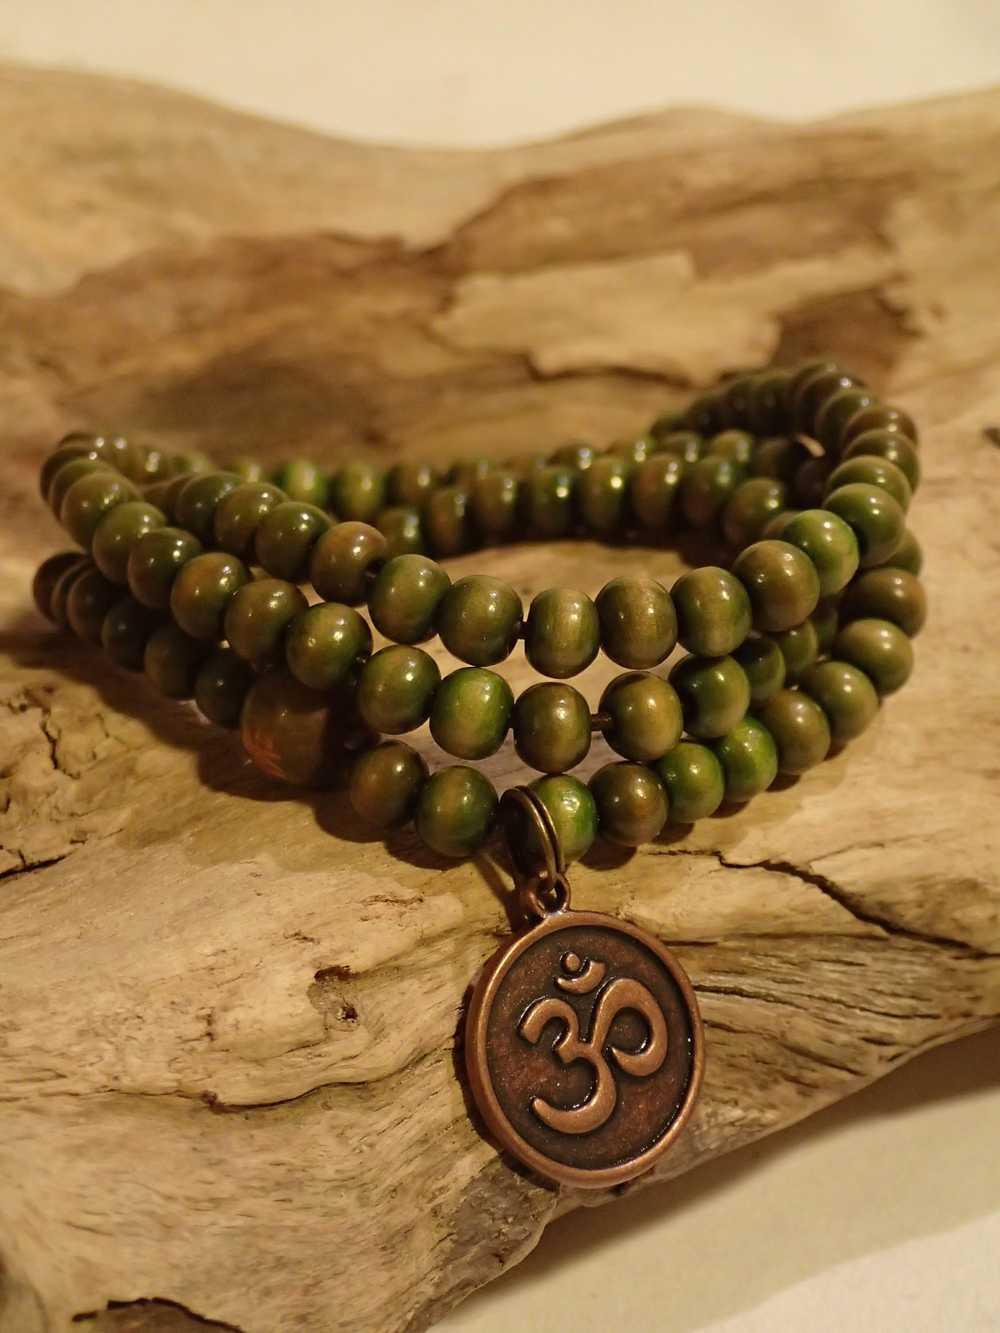 Atome-Crochu-_-product-_-collier-bracelet-mala-tibetain-en-bois-et-om-indien-01